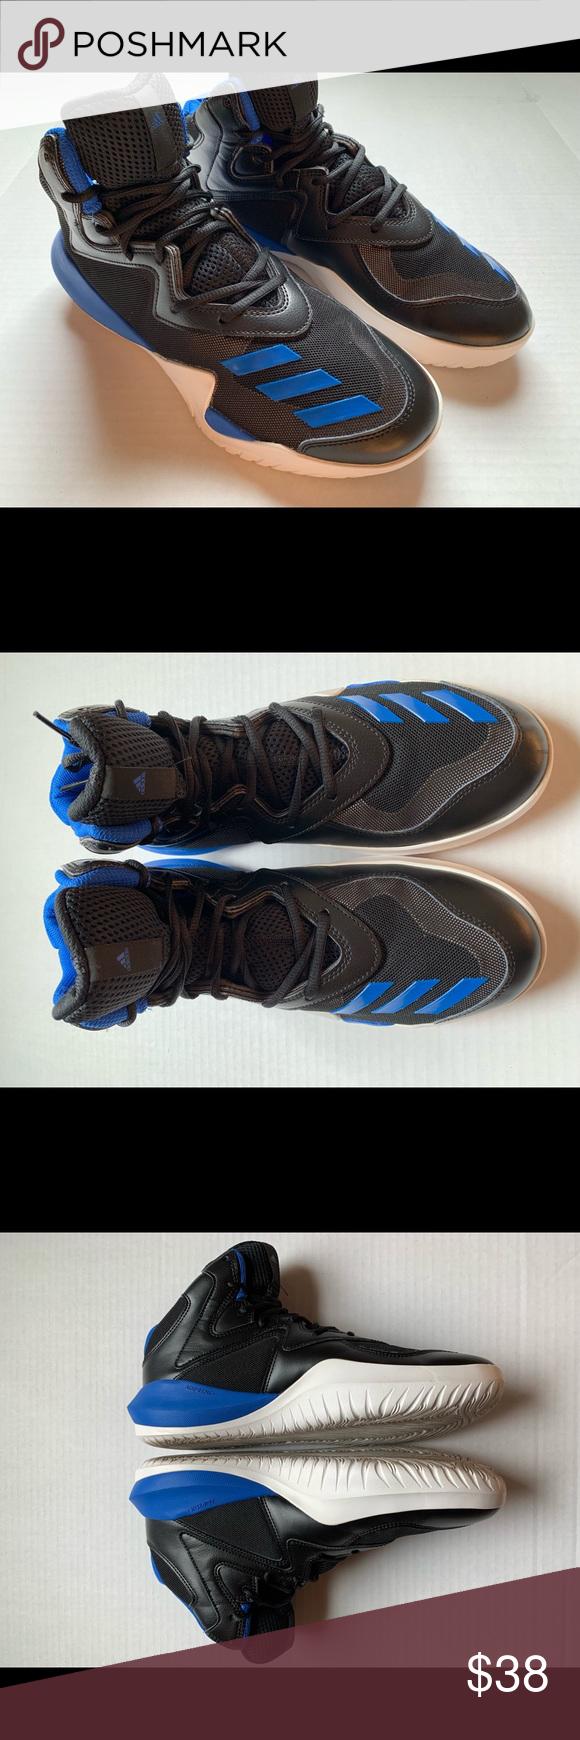 new concept bc80b 0c946 Adidas Basketball Men s Crazy Team 2017 Shoe Adidas Basketball Men s Crazy  Team 2017 Basketball Shoe. Size 9.5 US. Color Black Blue-grey.